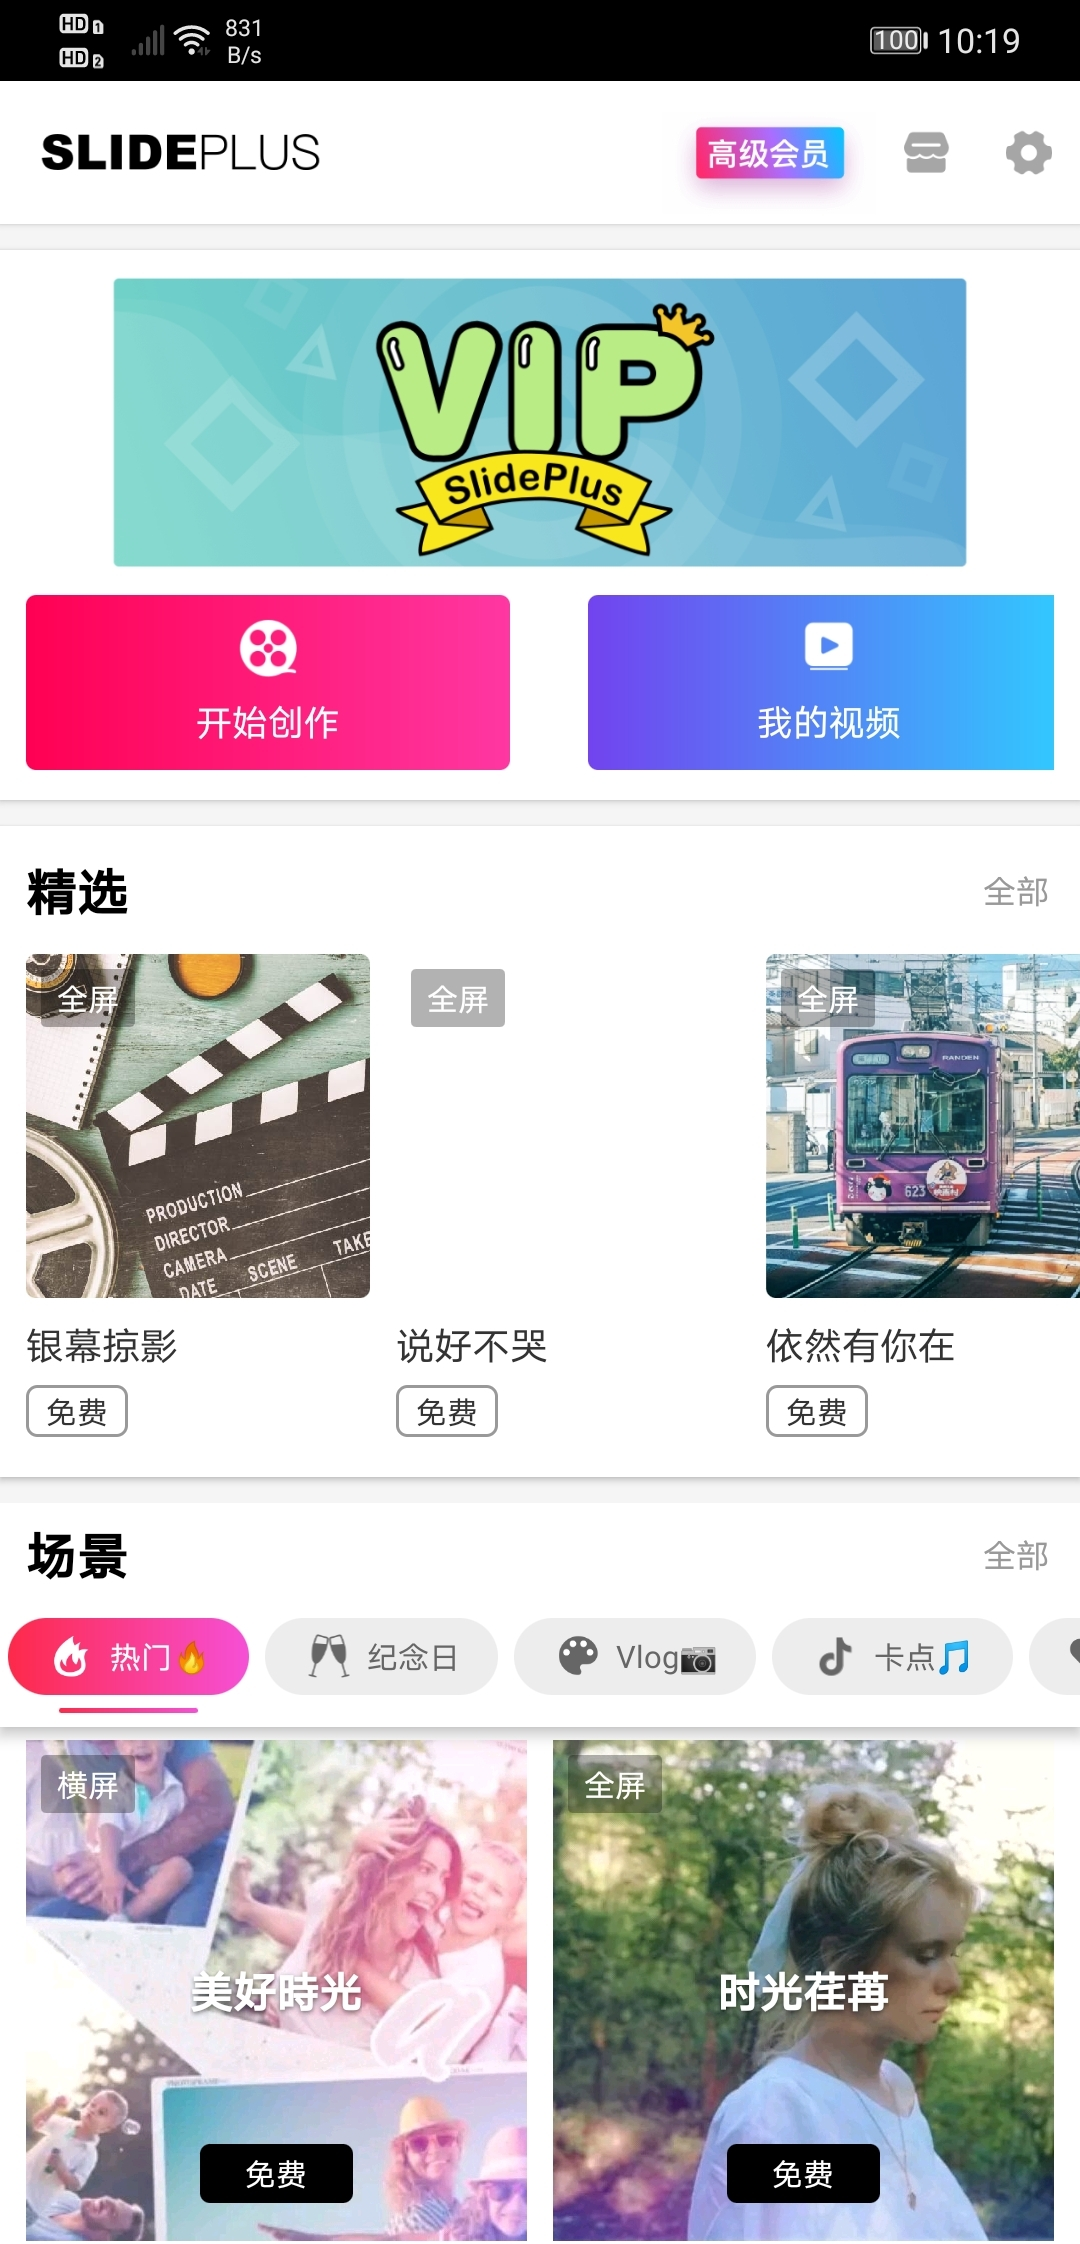 Screenshot_20201118_101948_com.quvideo.slideplus.jpg